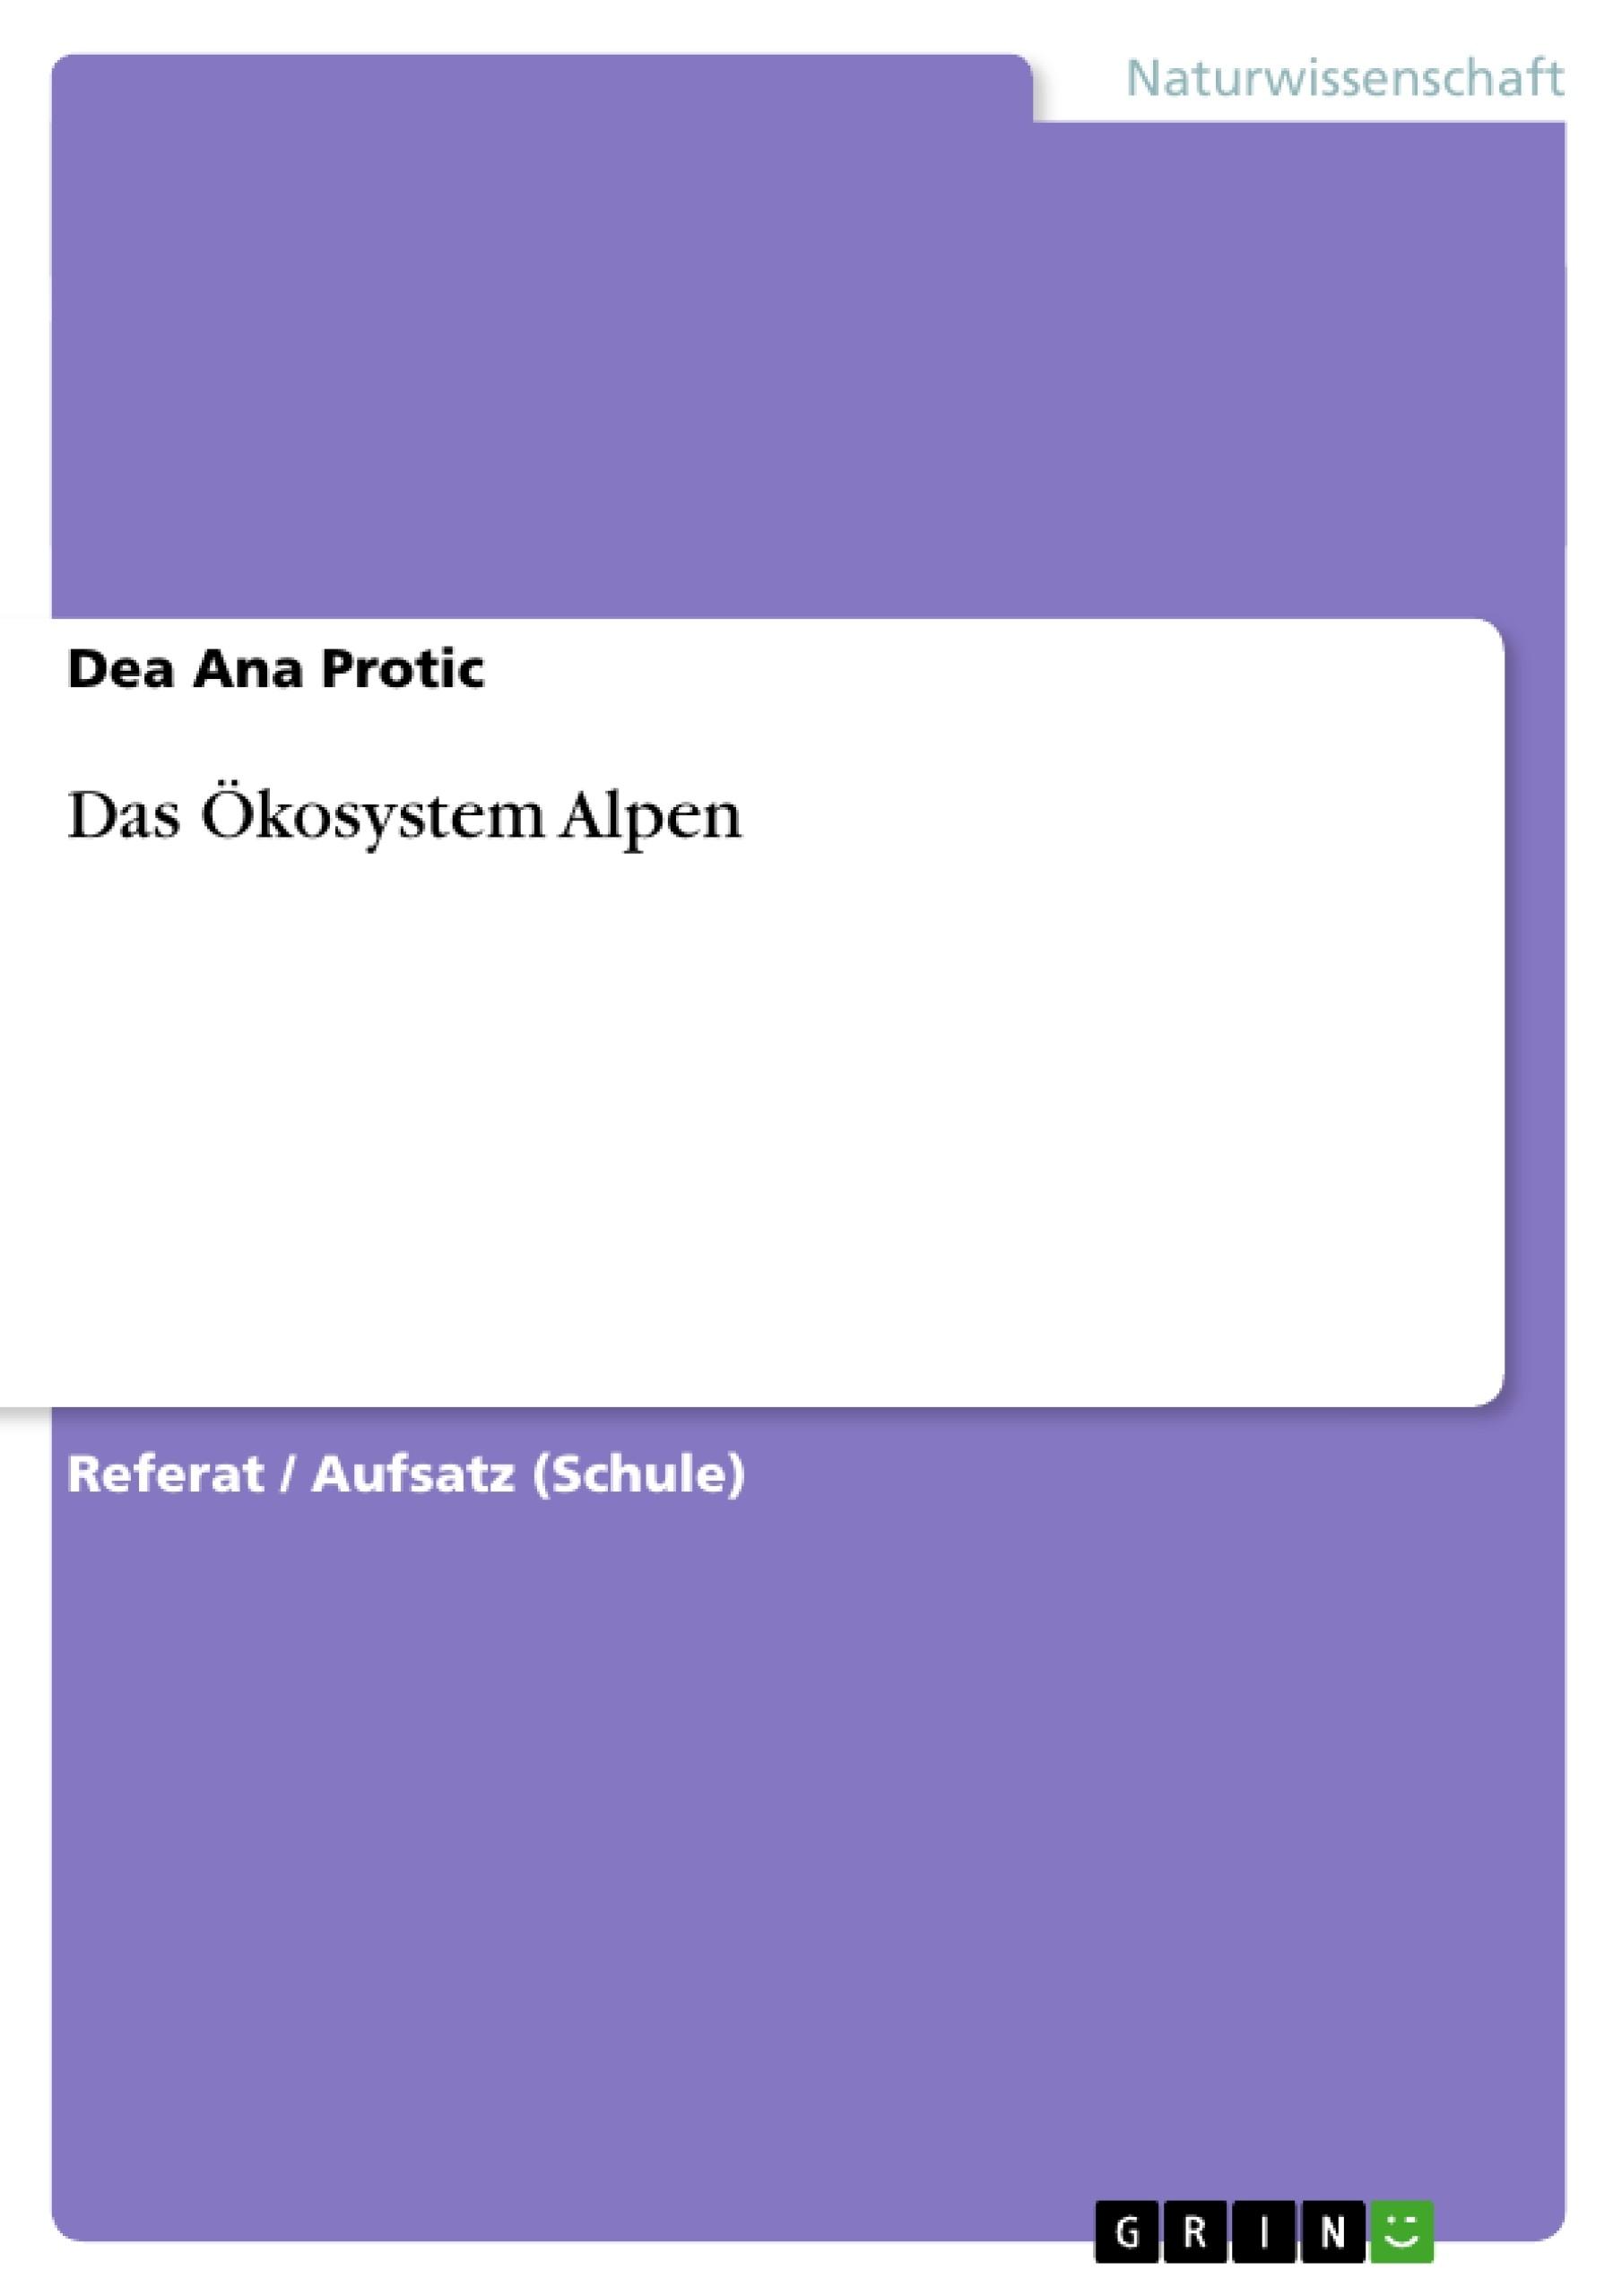 Titel: Das Ökosystem Alpen